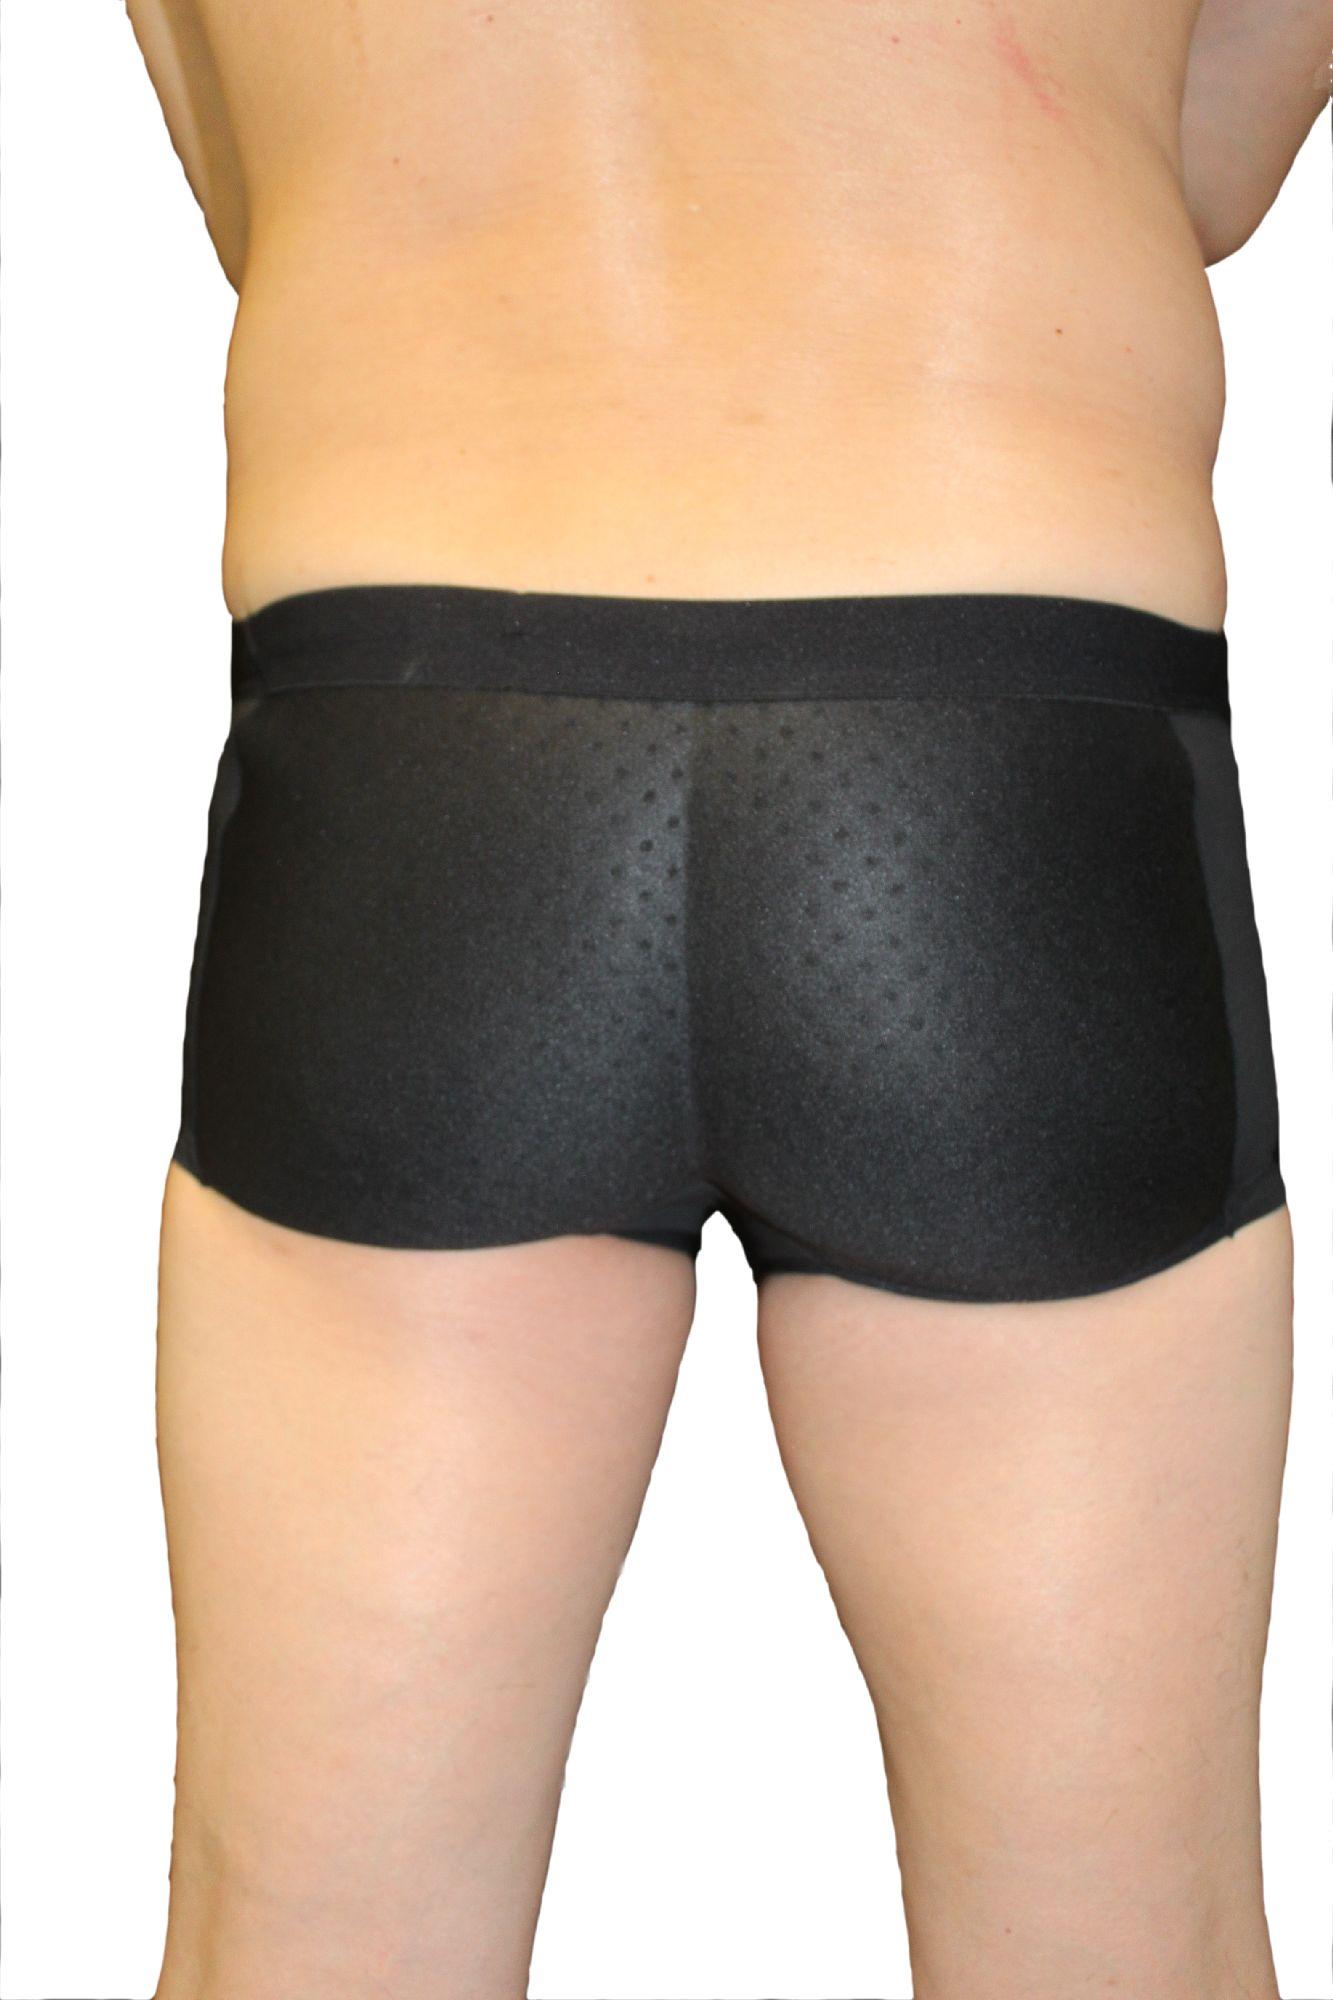 30c0a55448b4 Fullness - Fullness His Butt Booster Men's Underwear Padded Booty Backside  Buttocks Enhancer Molded Pad Boyshort Brief with Air Flow Butt Pads -  Walmart.com